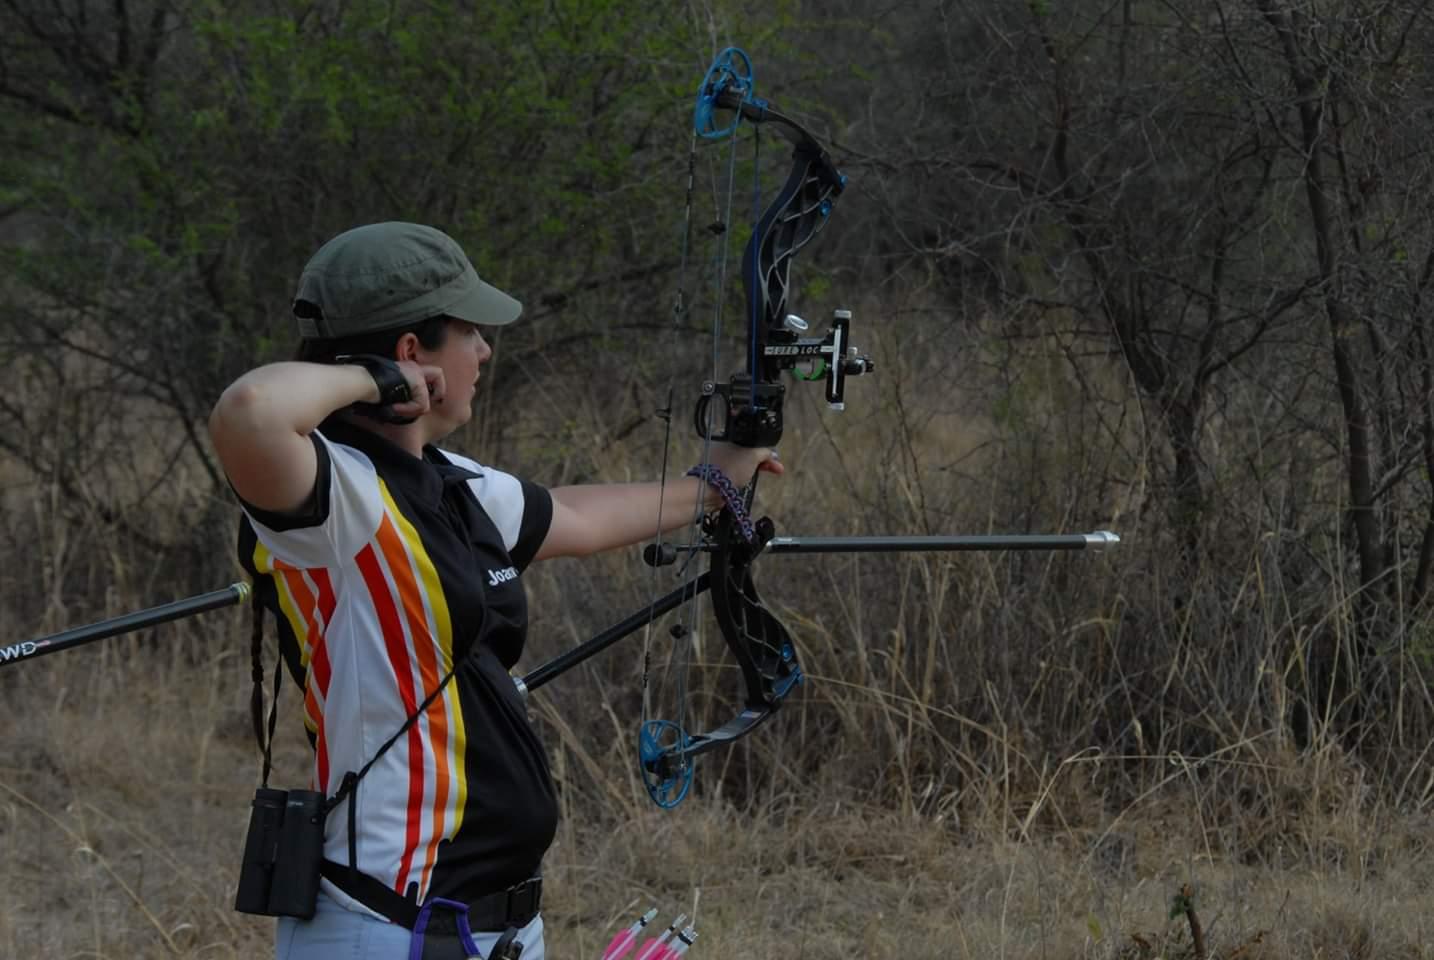 FB IMG 1539541839576 - Chris and Joanette Karsten at the International Field Archery Association World Championships 2018